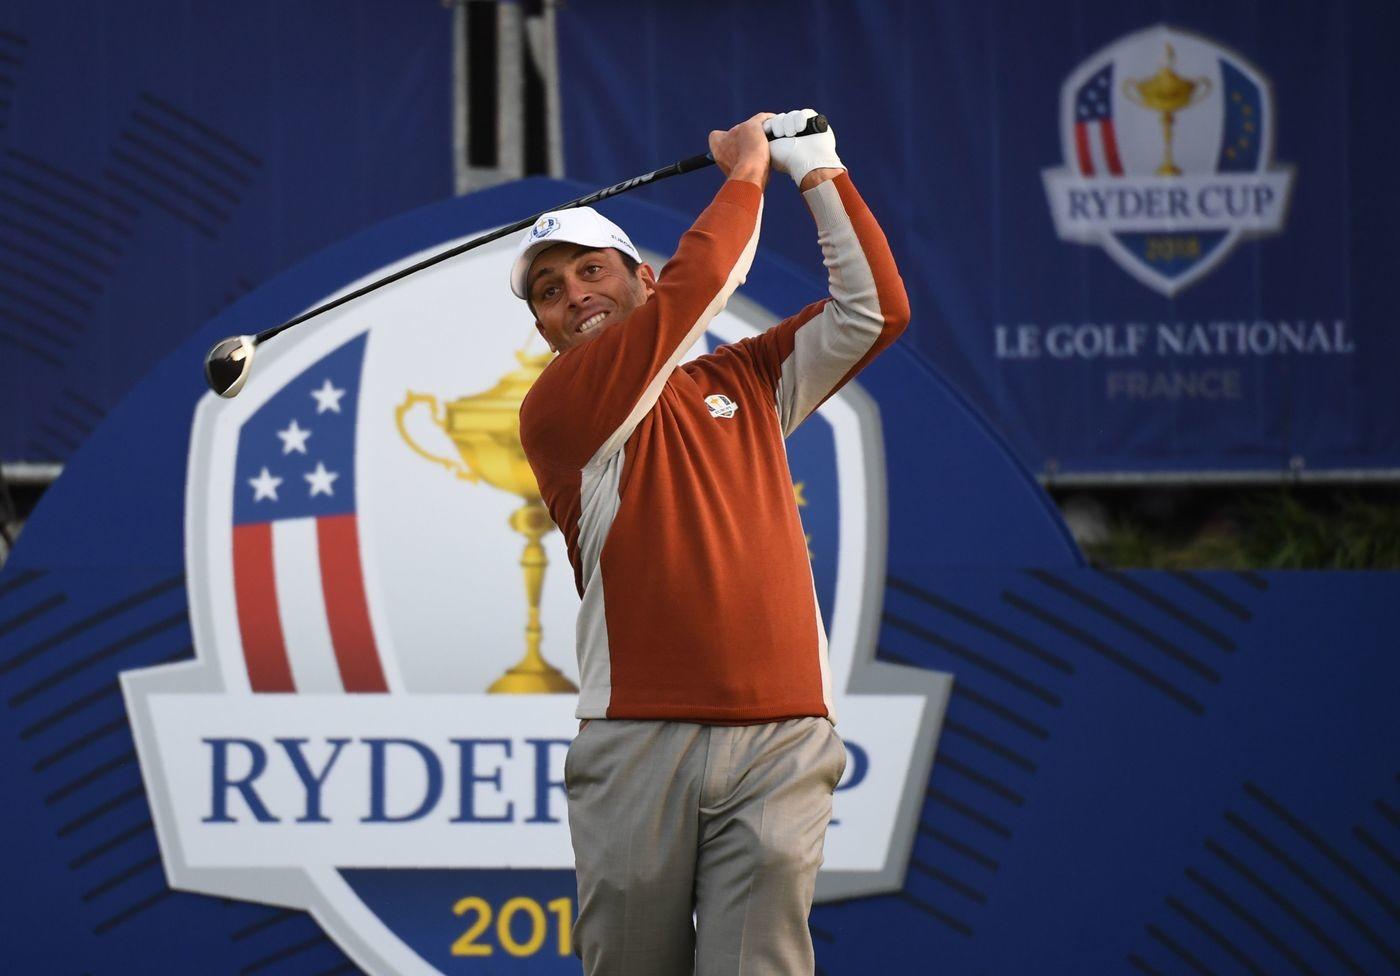 I dieci eventi sportivi del 2018 Francesco Molinari golf Ryder Cup Race to Dubai Master